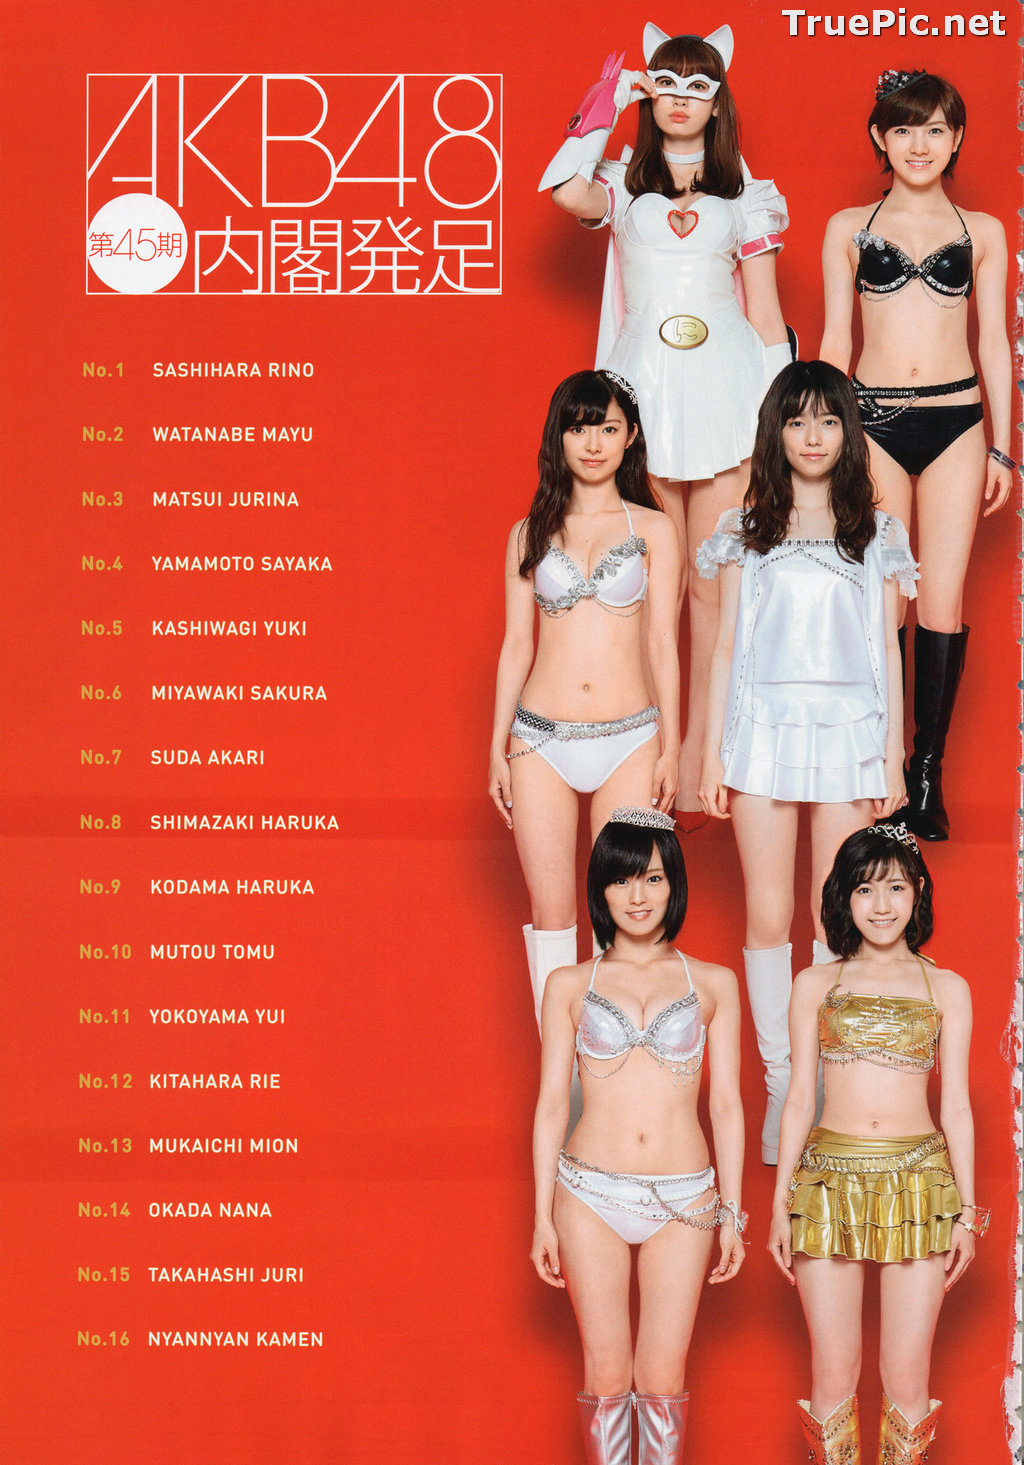 Image AKB48 General Election! Swimsuit Surprise Announcement 2016 - TruePic.net - Picture-5